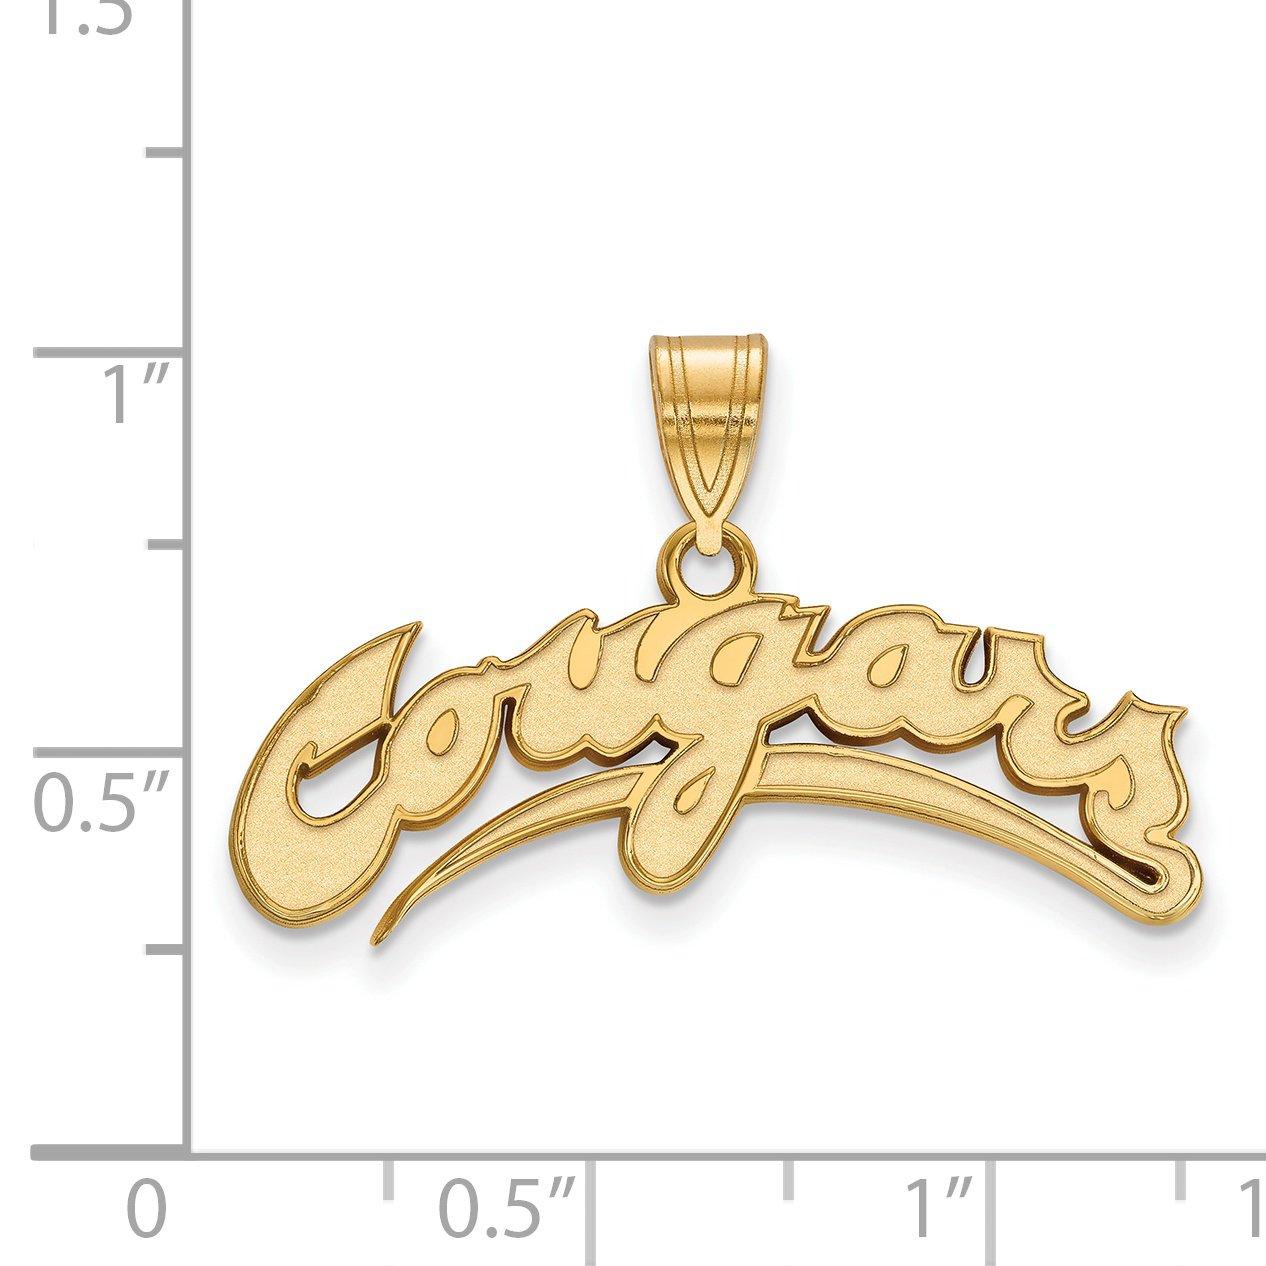 10k Yellow Gold Washington State WSU Cougars School Mascot Name Pendant 11x30mm